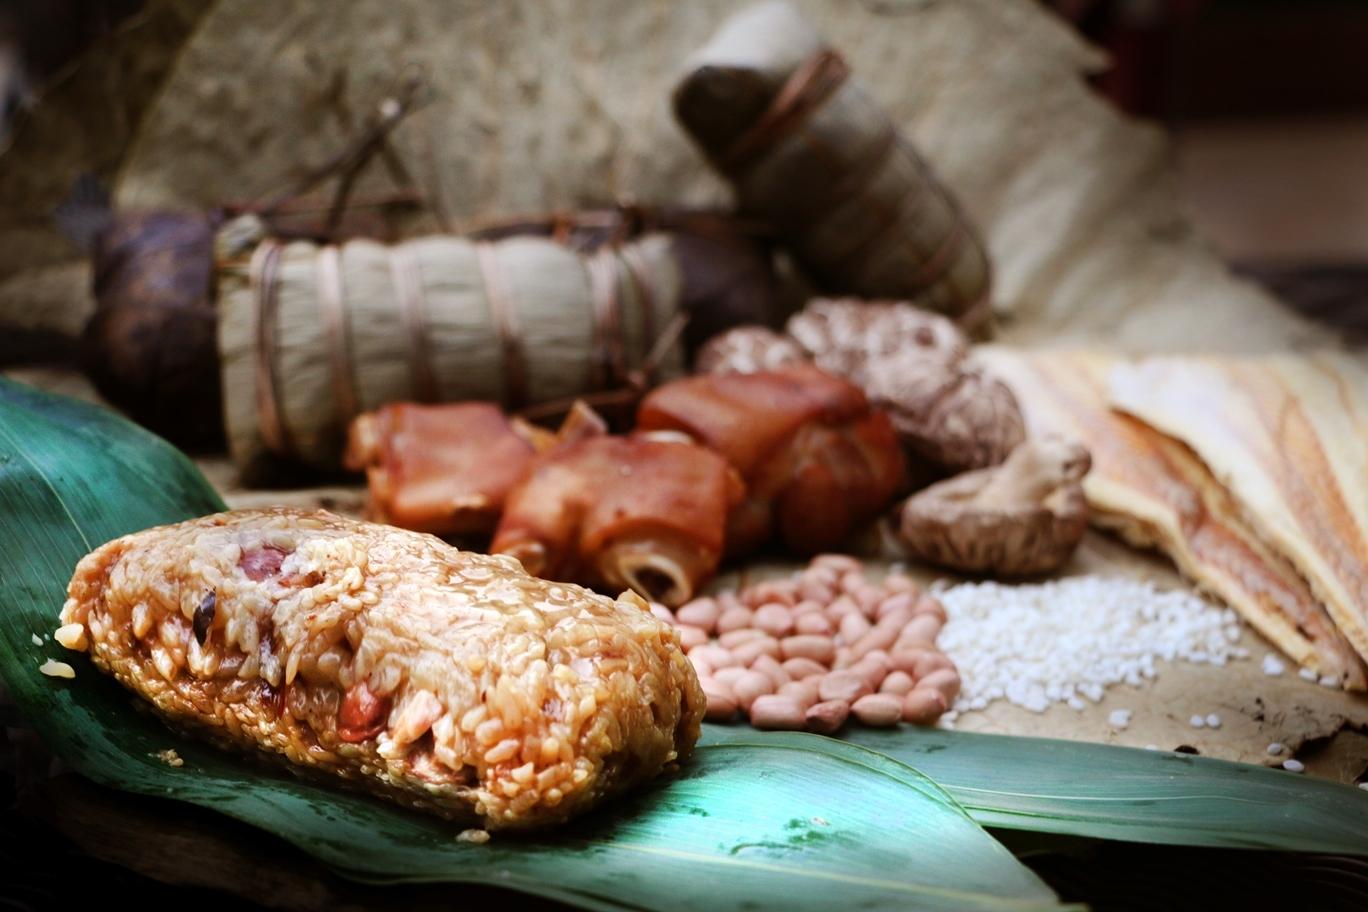 Pork trotter dumpling from Hua Ting Restaurant